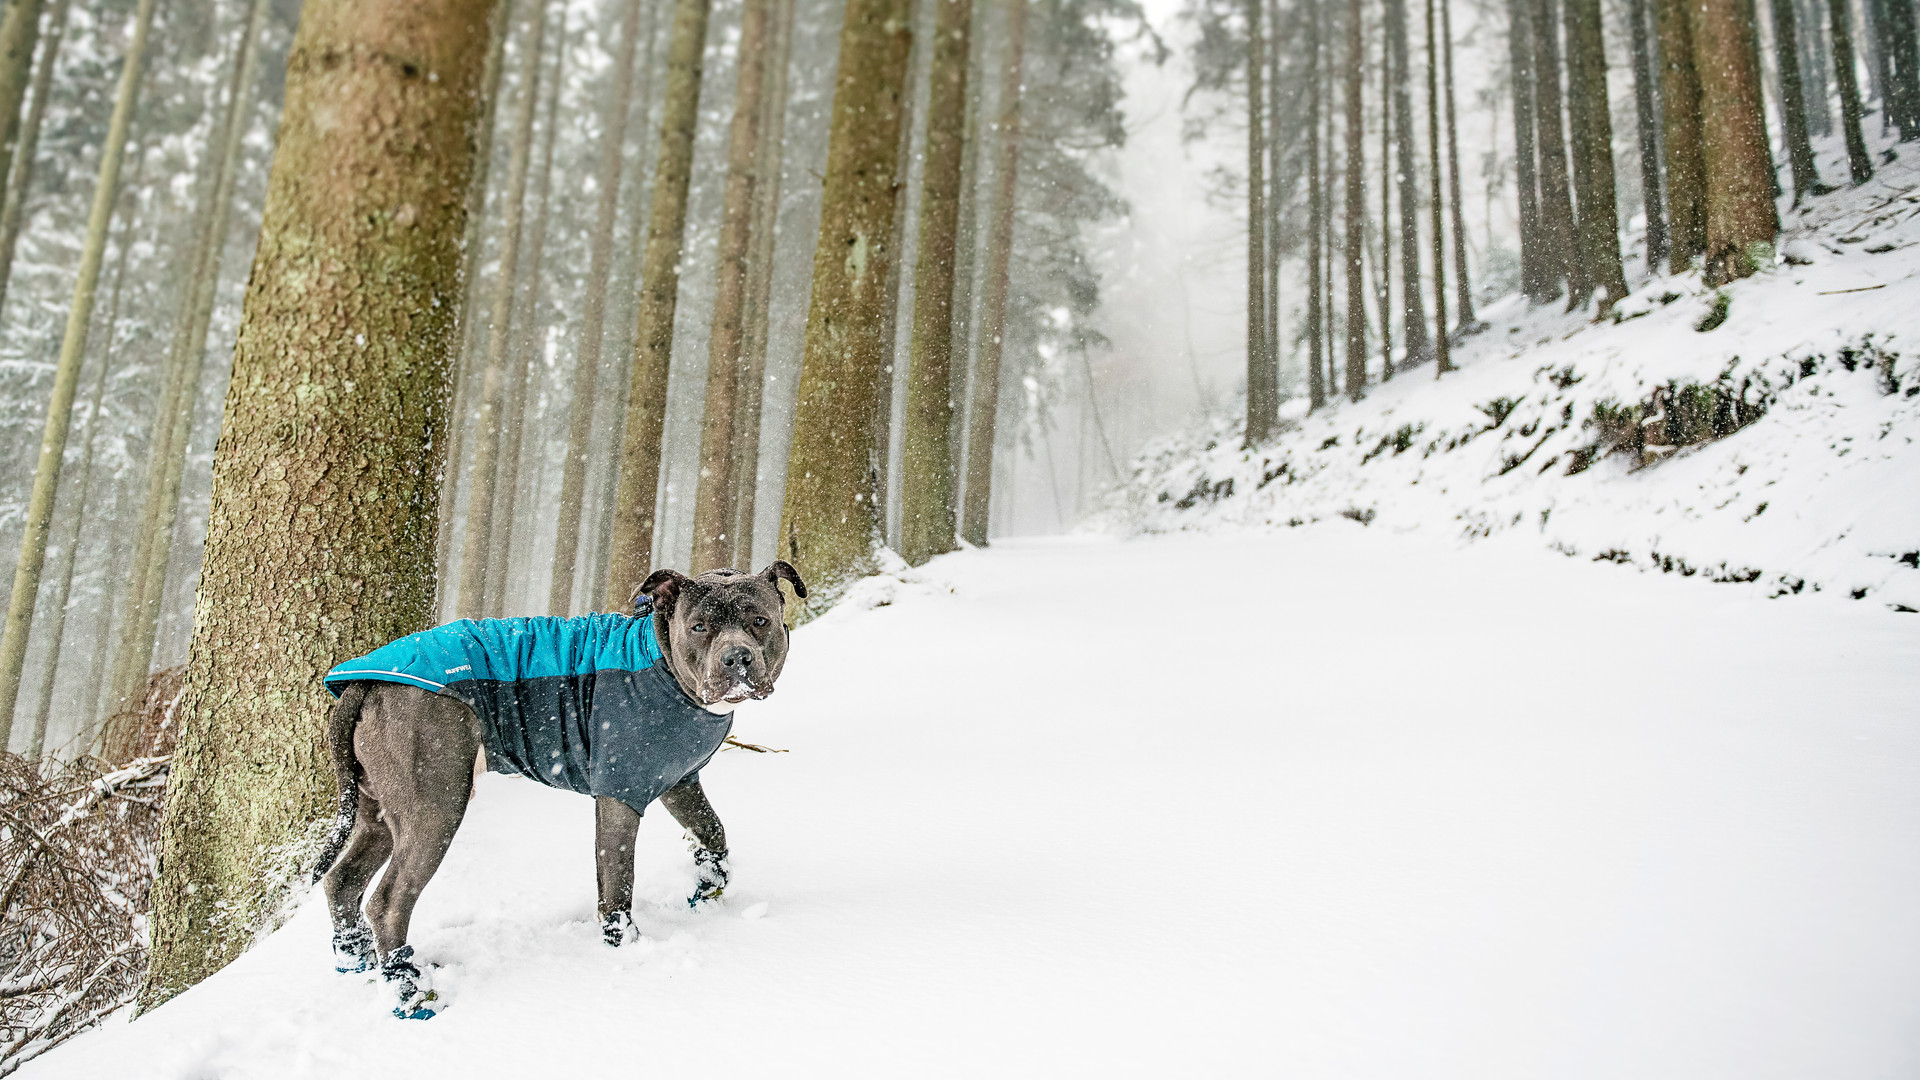 Hintobear's first snow...